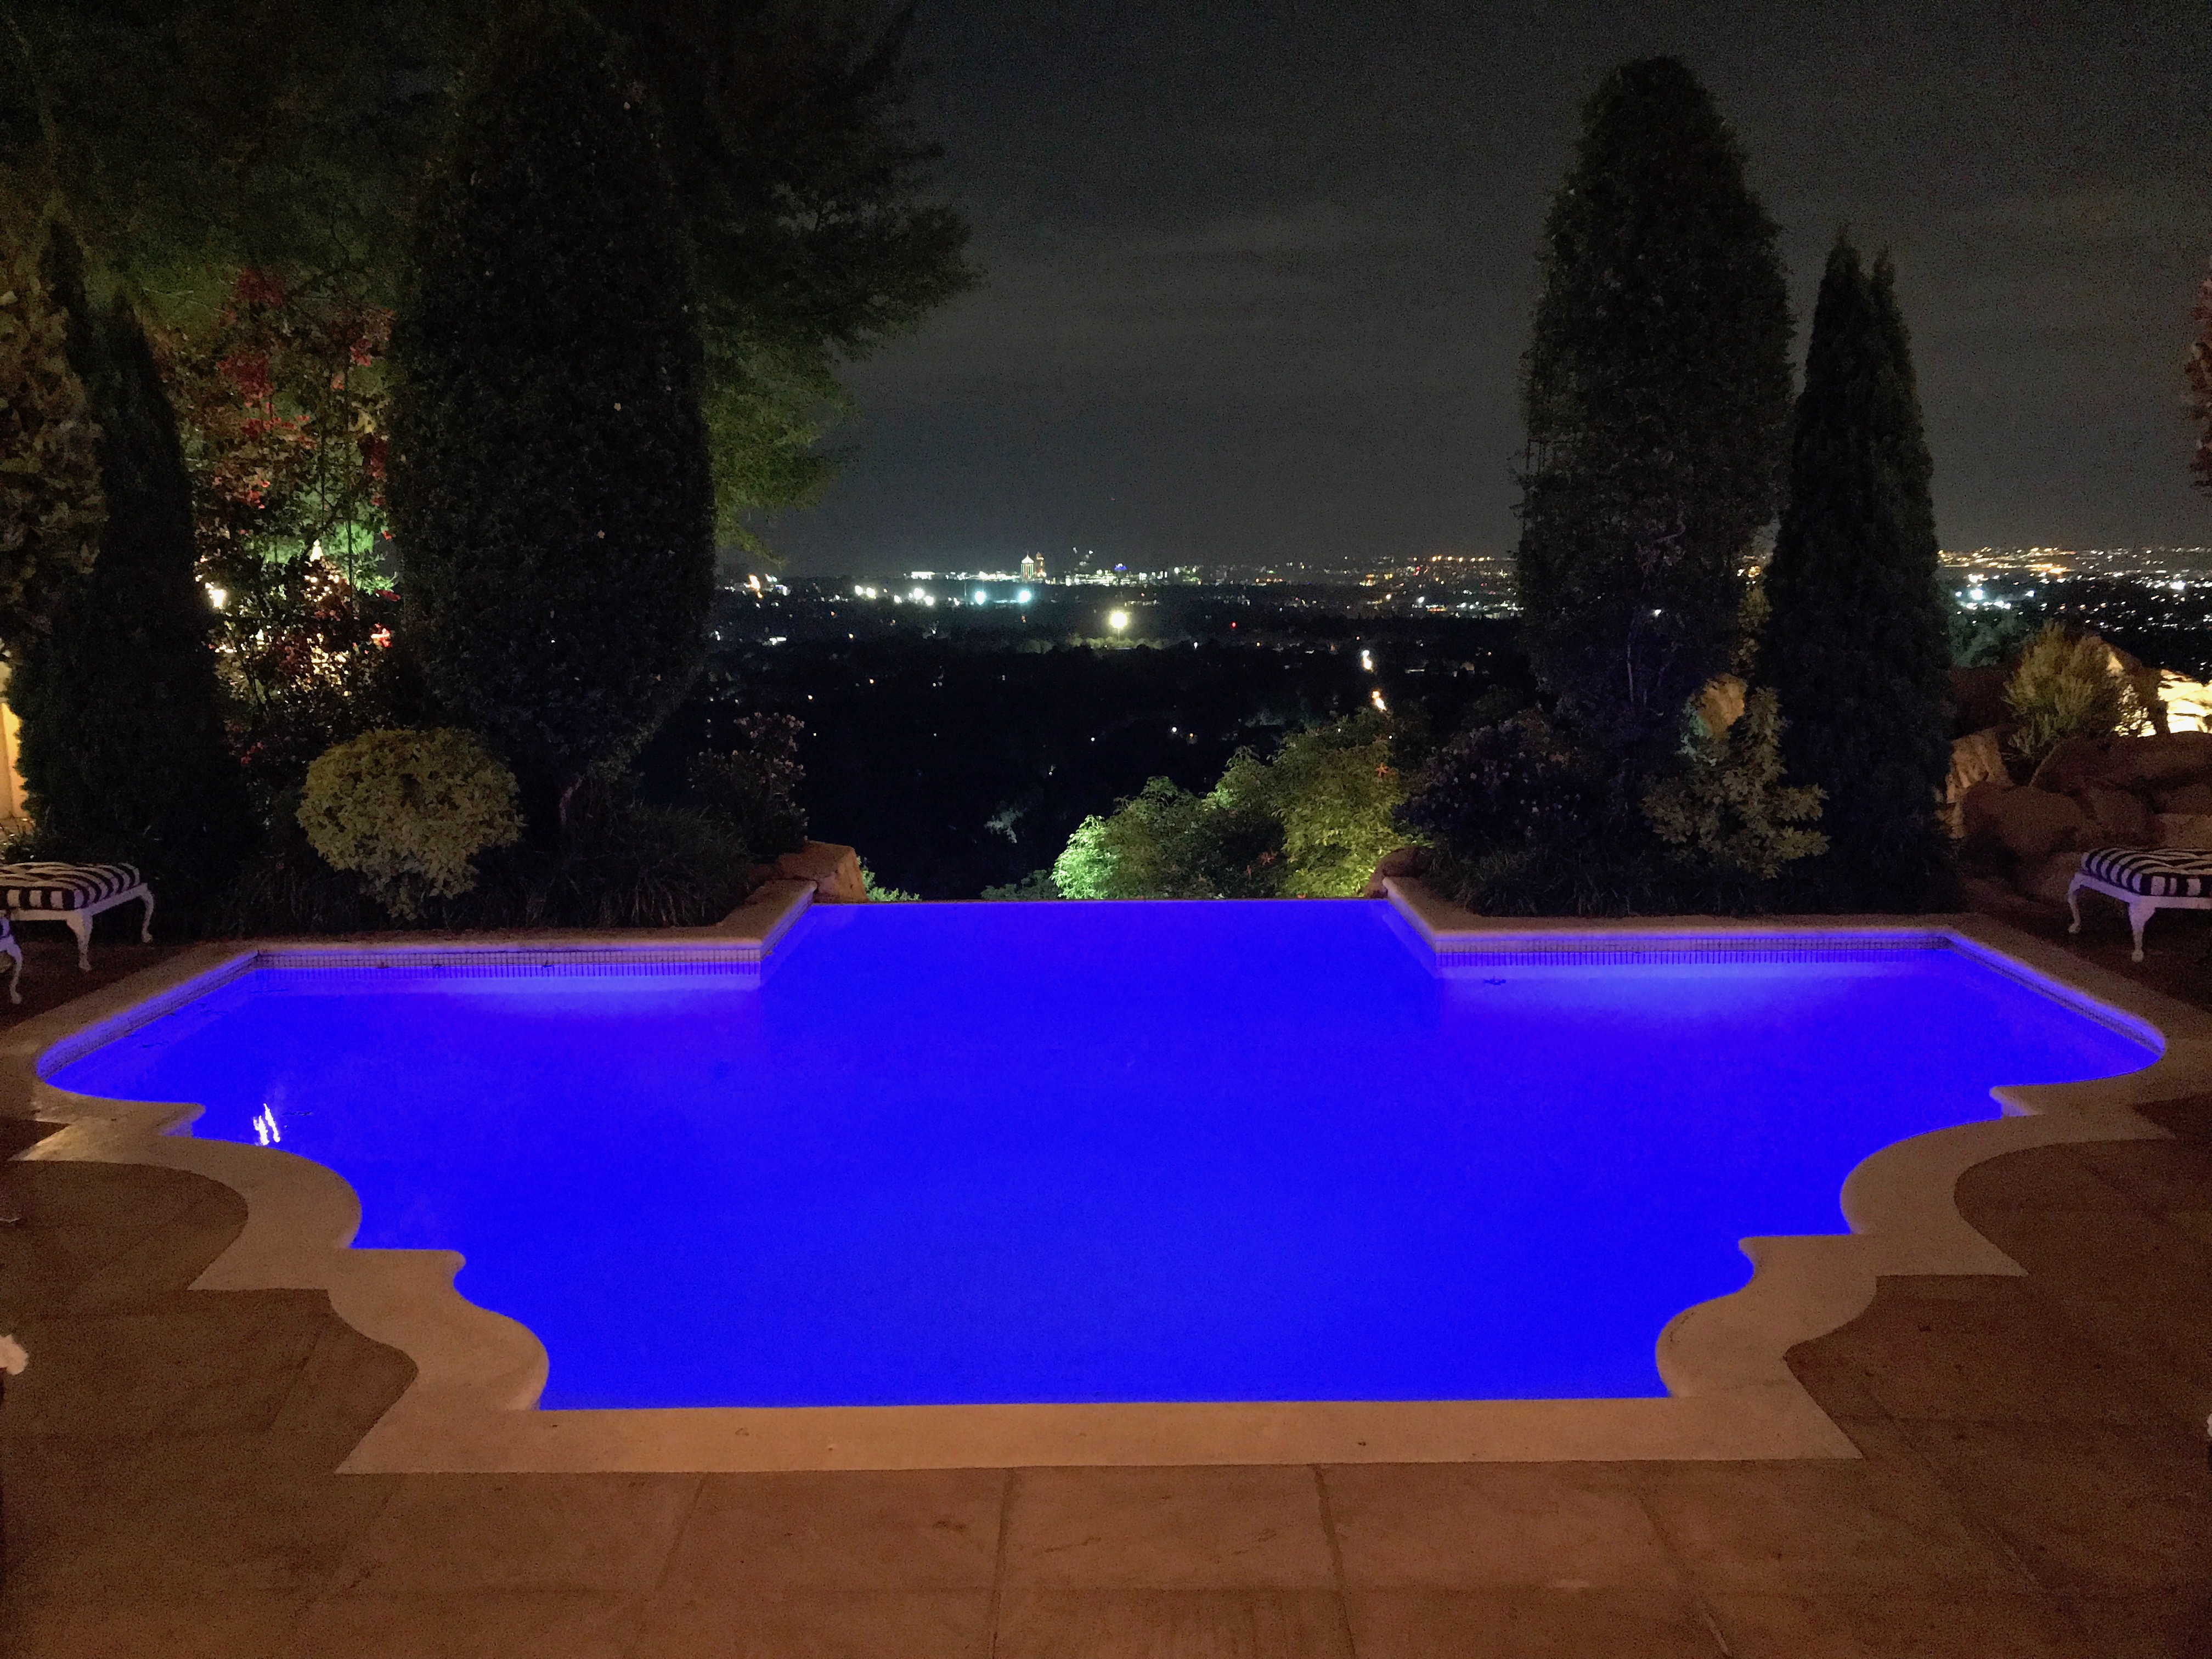 munro-hotel-pool-johannesburg-lustforthesublime